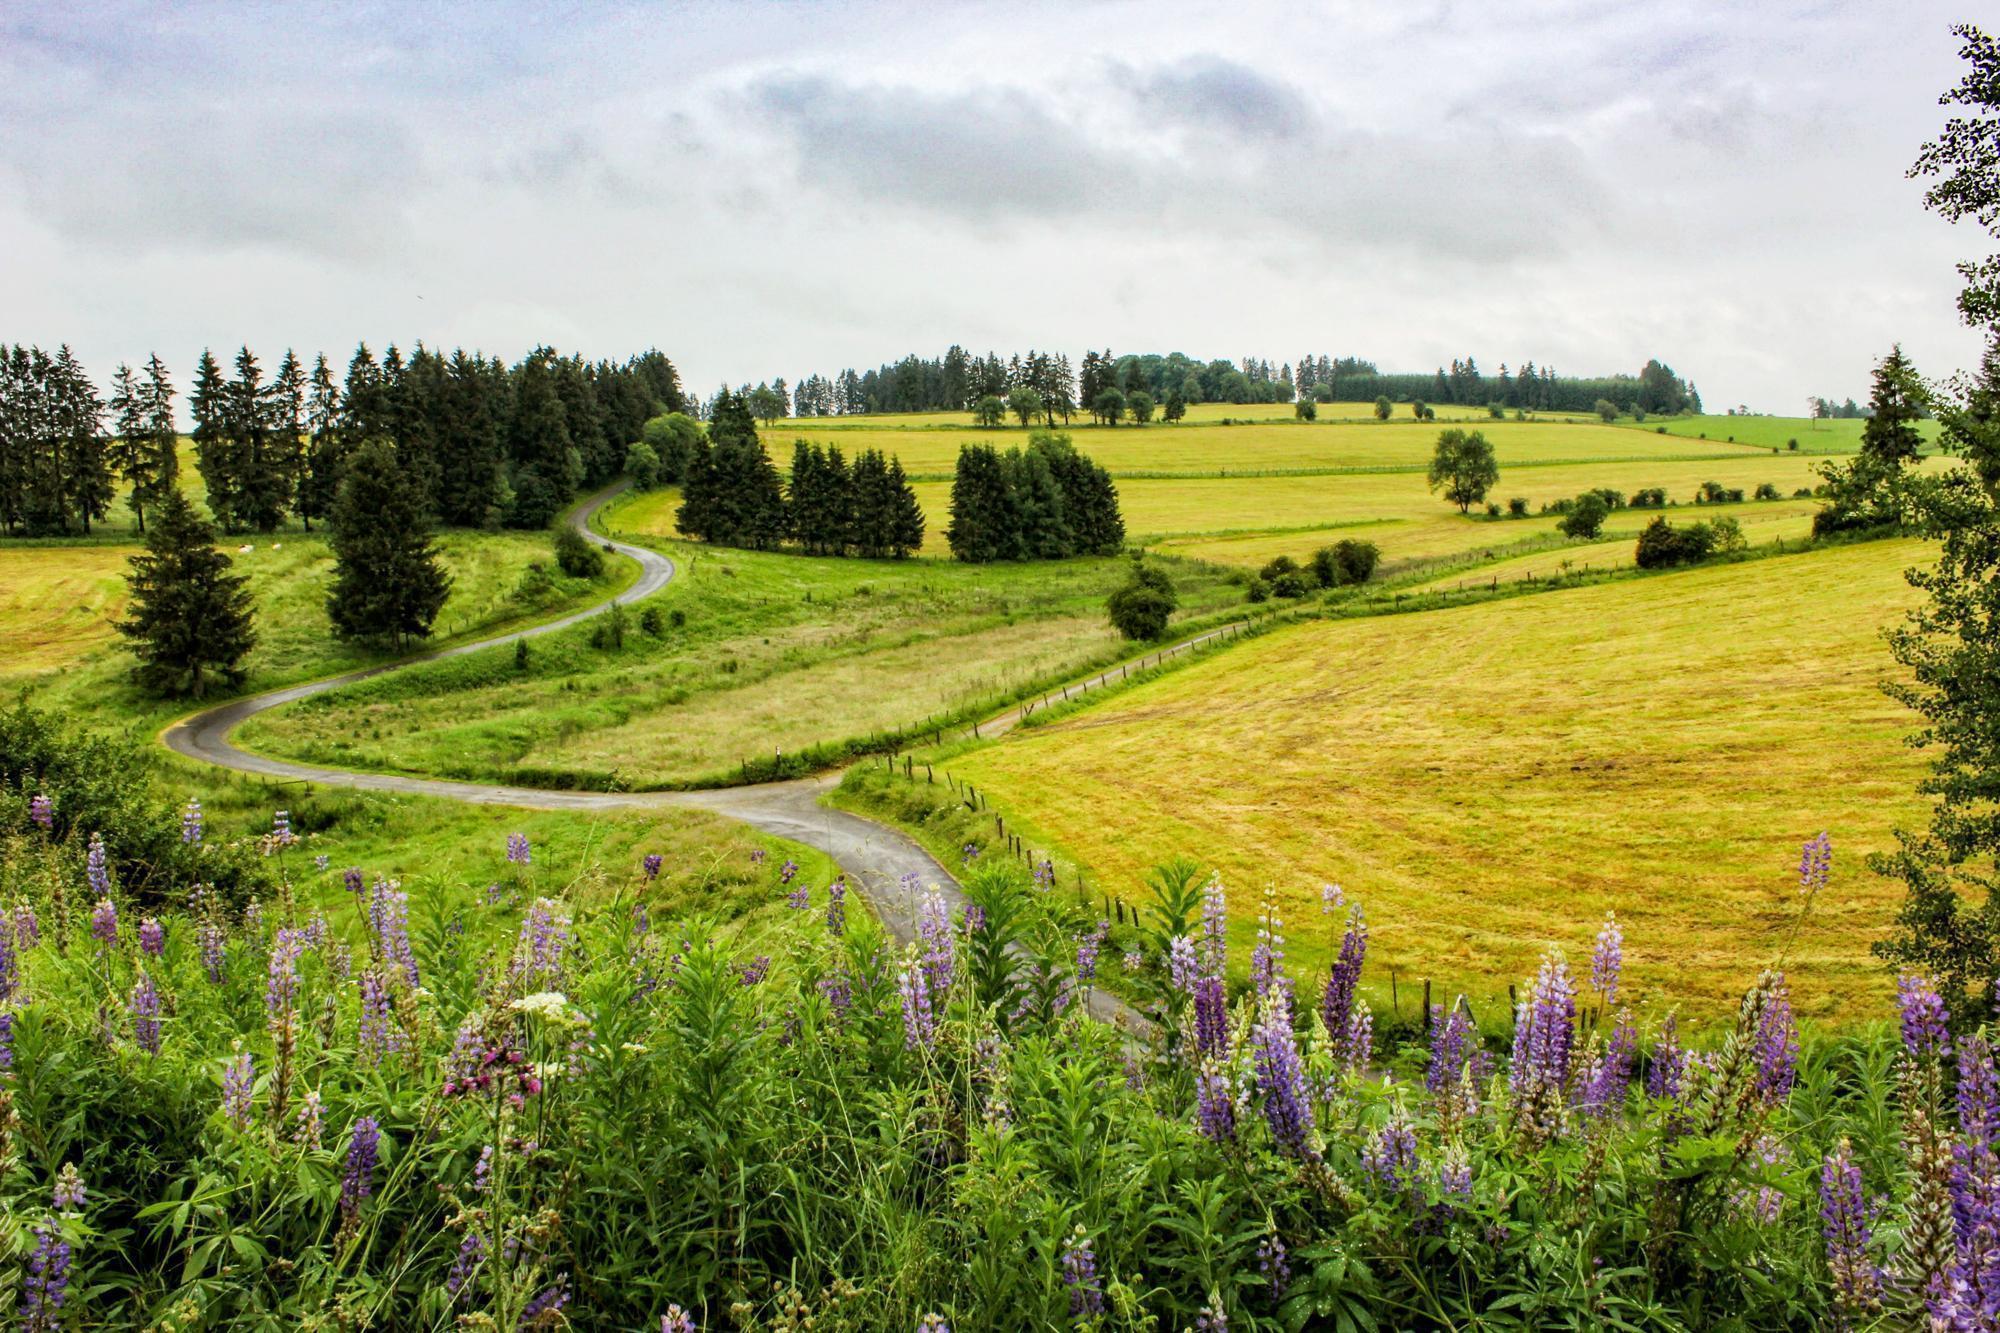 The long and winding road between Bütgenbach and Büllingen